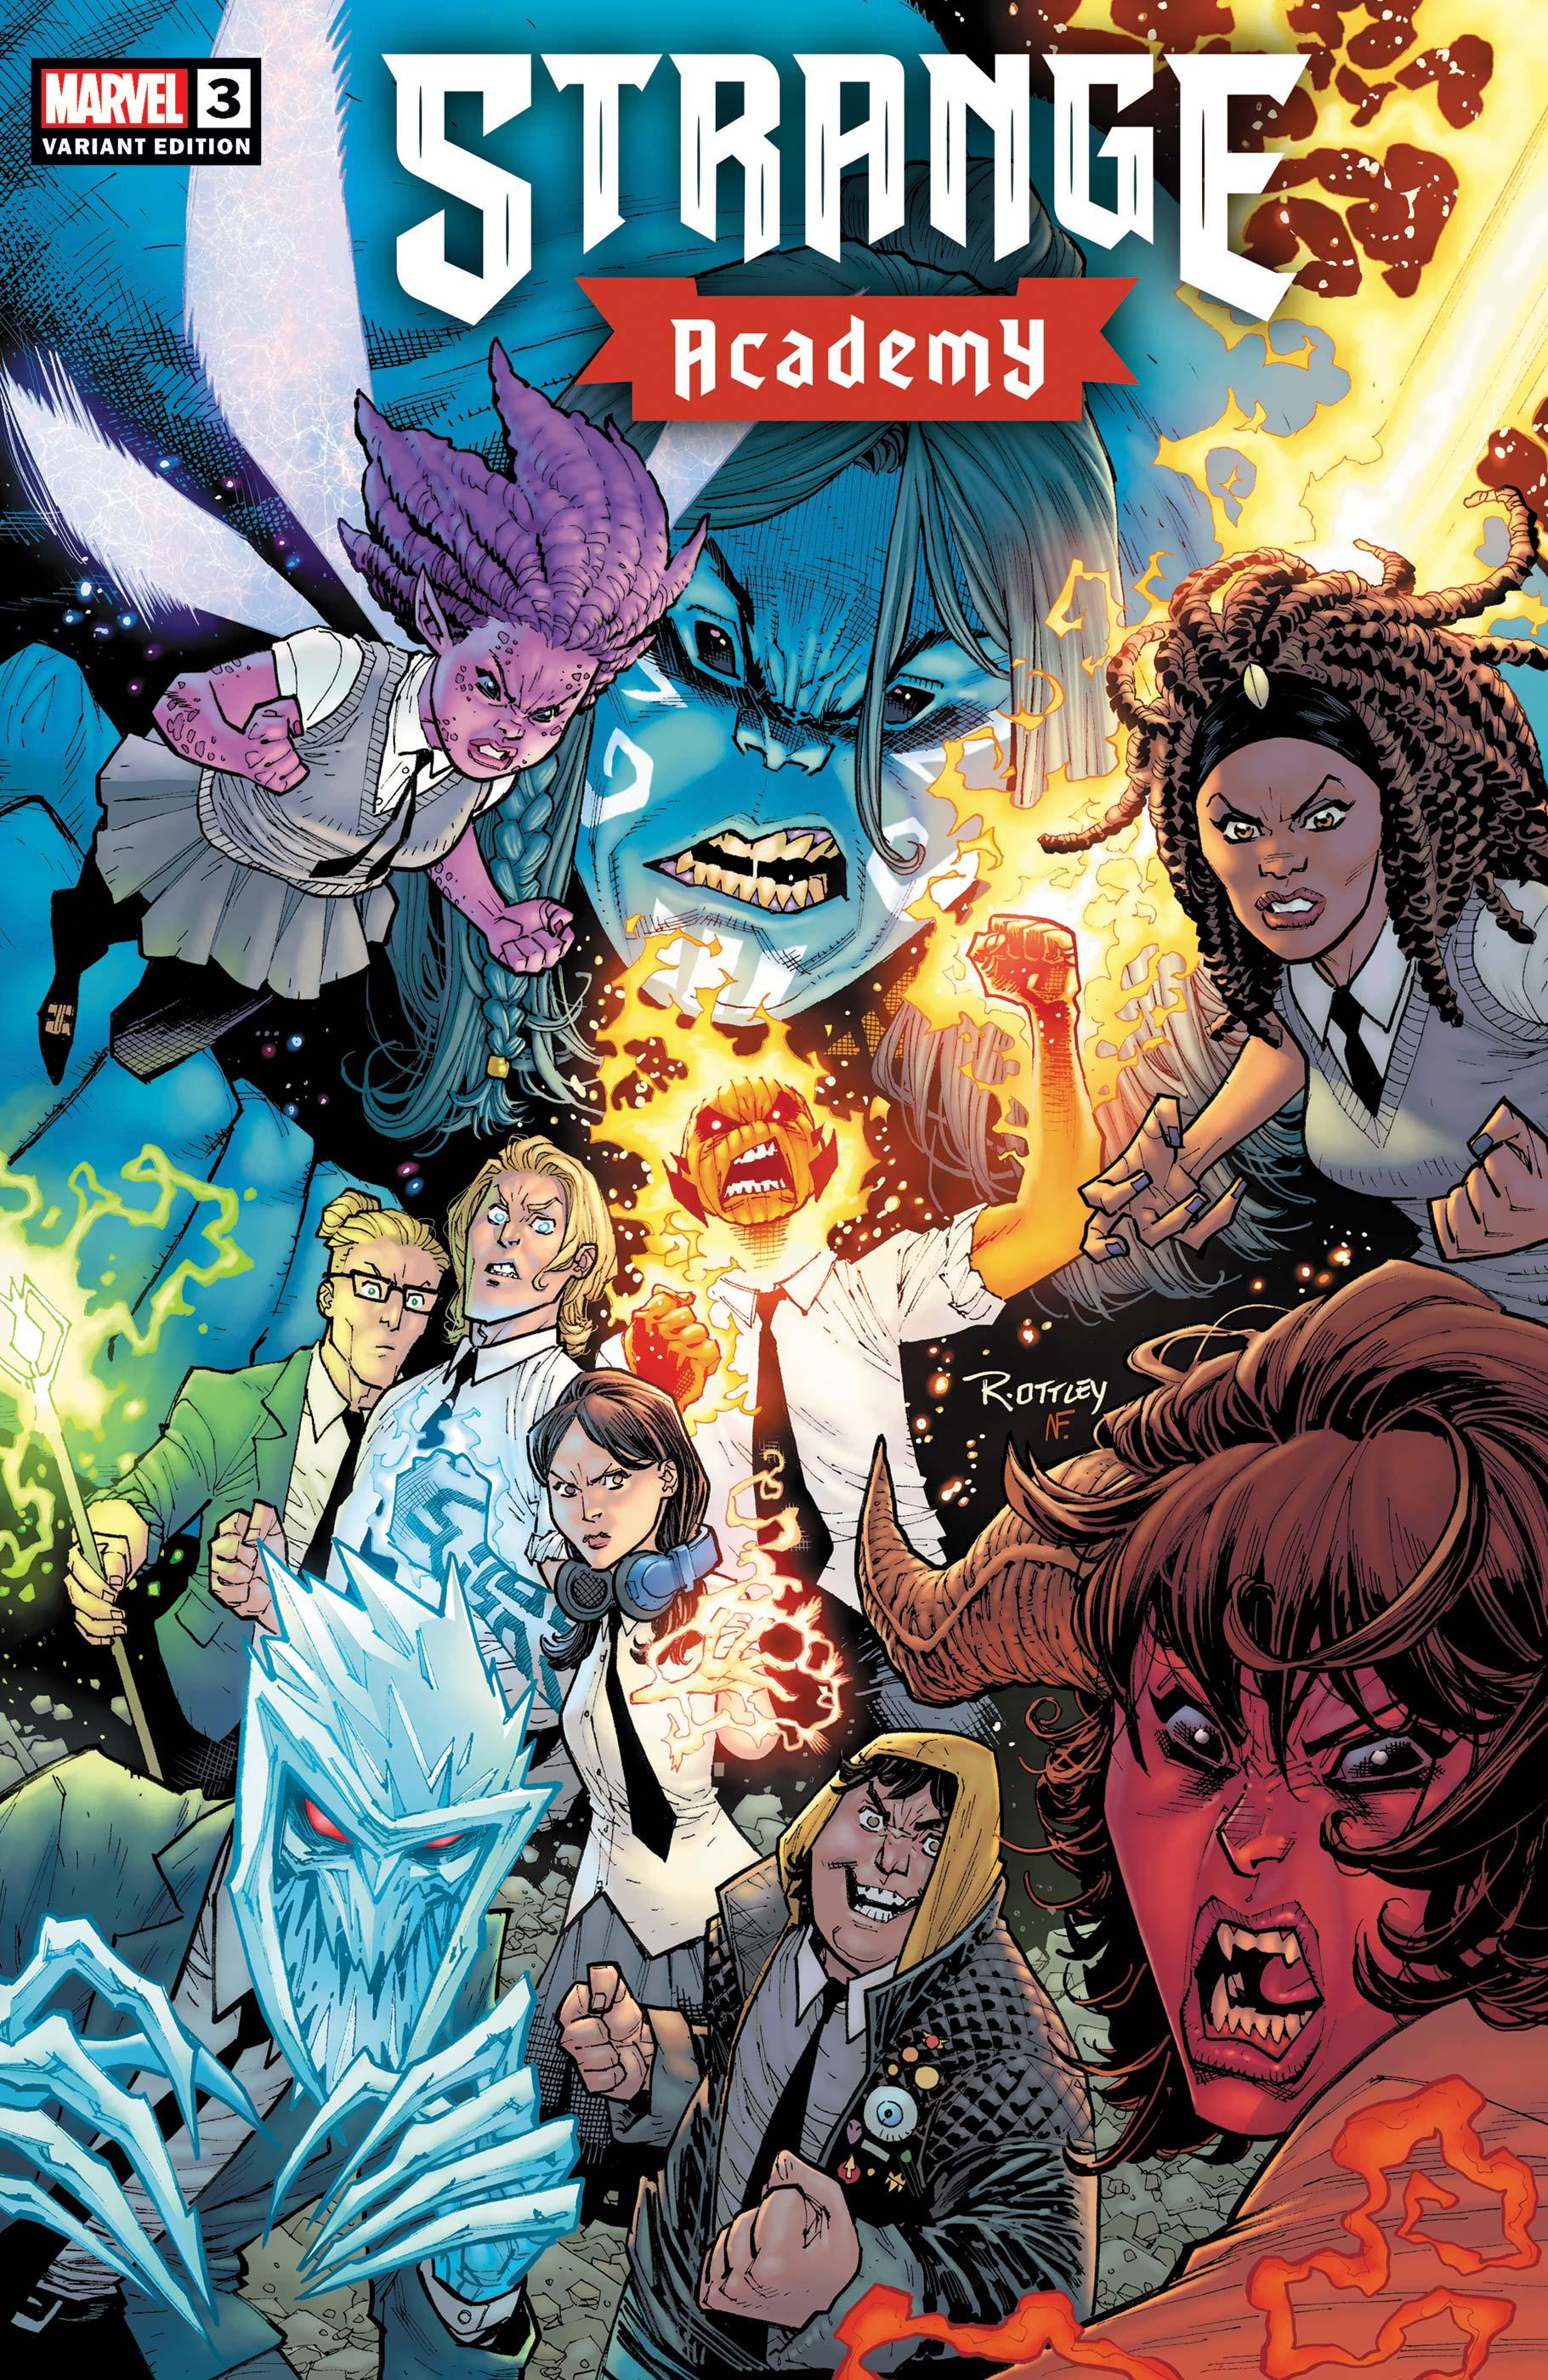 Strange Academy (2020) #3 (Variant)